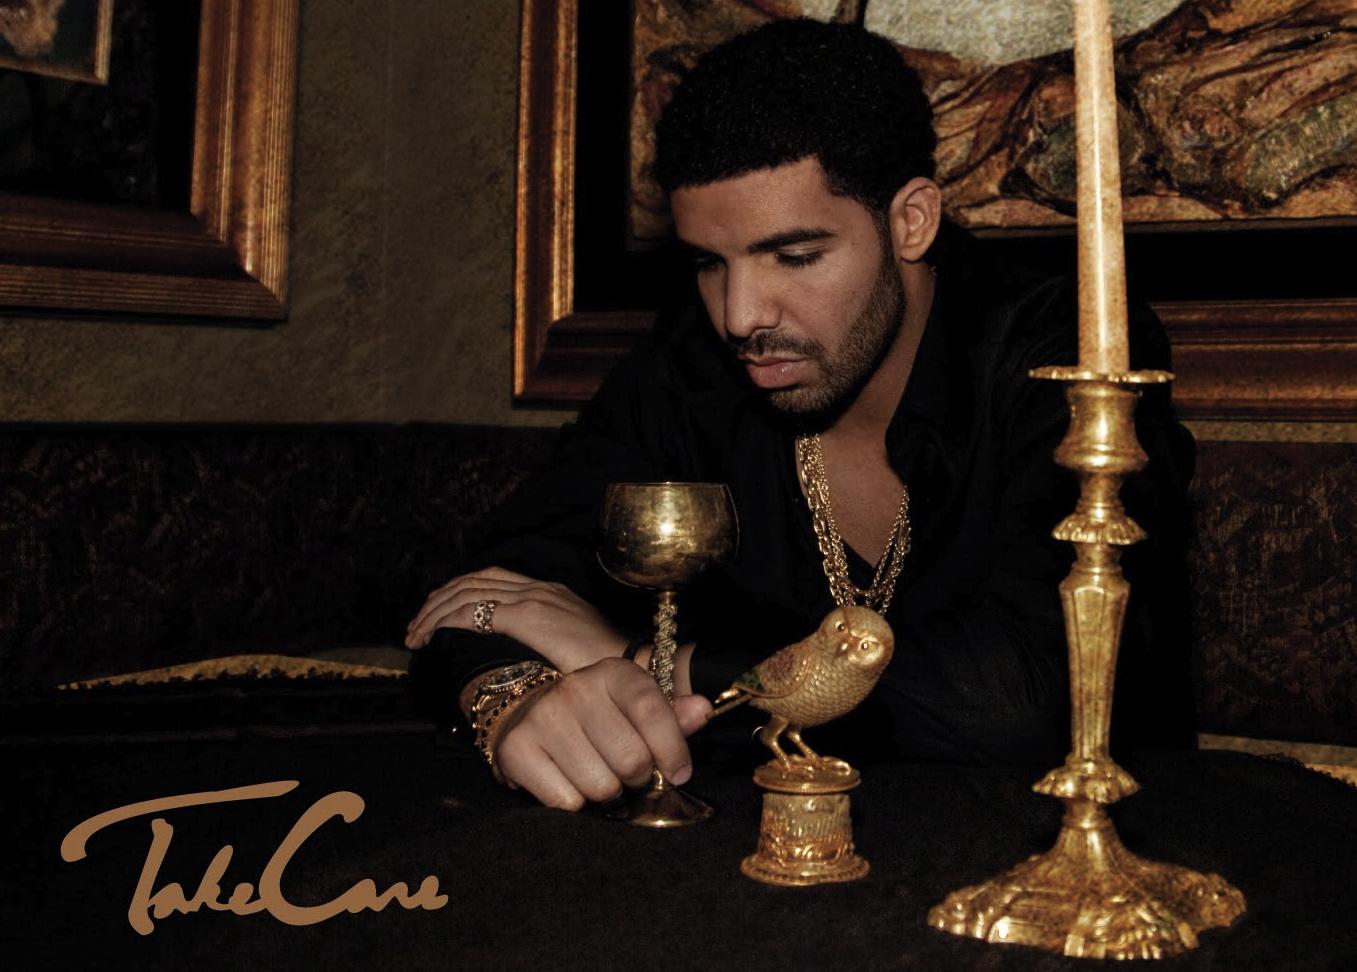 http://2.bp.blogspot.com/-3MOVrU3w0F4/TqCzNW67PhI/AAAAAAAAEKI/lGzUL1K8c2s/s1600/Drake-Take+Care-Promo+Trailer.jpg